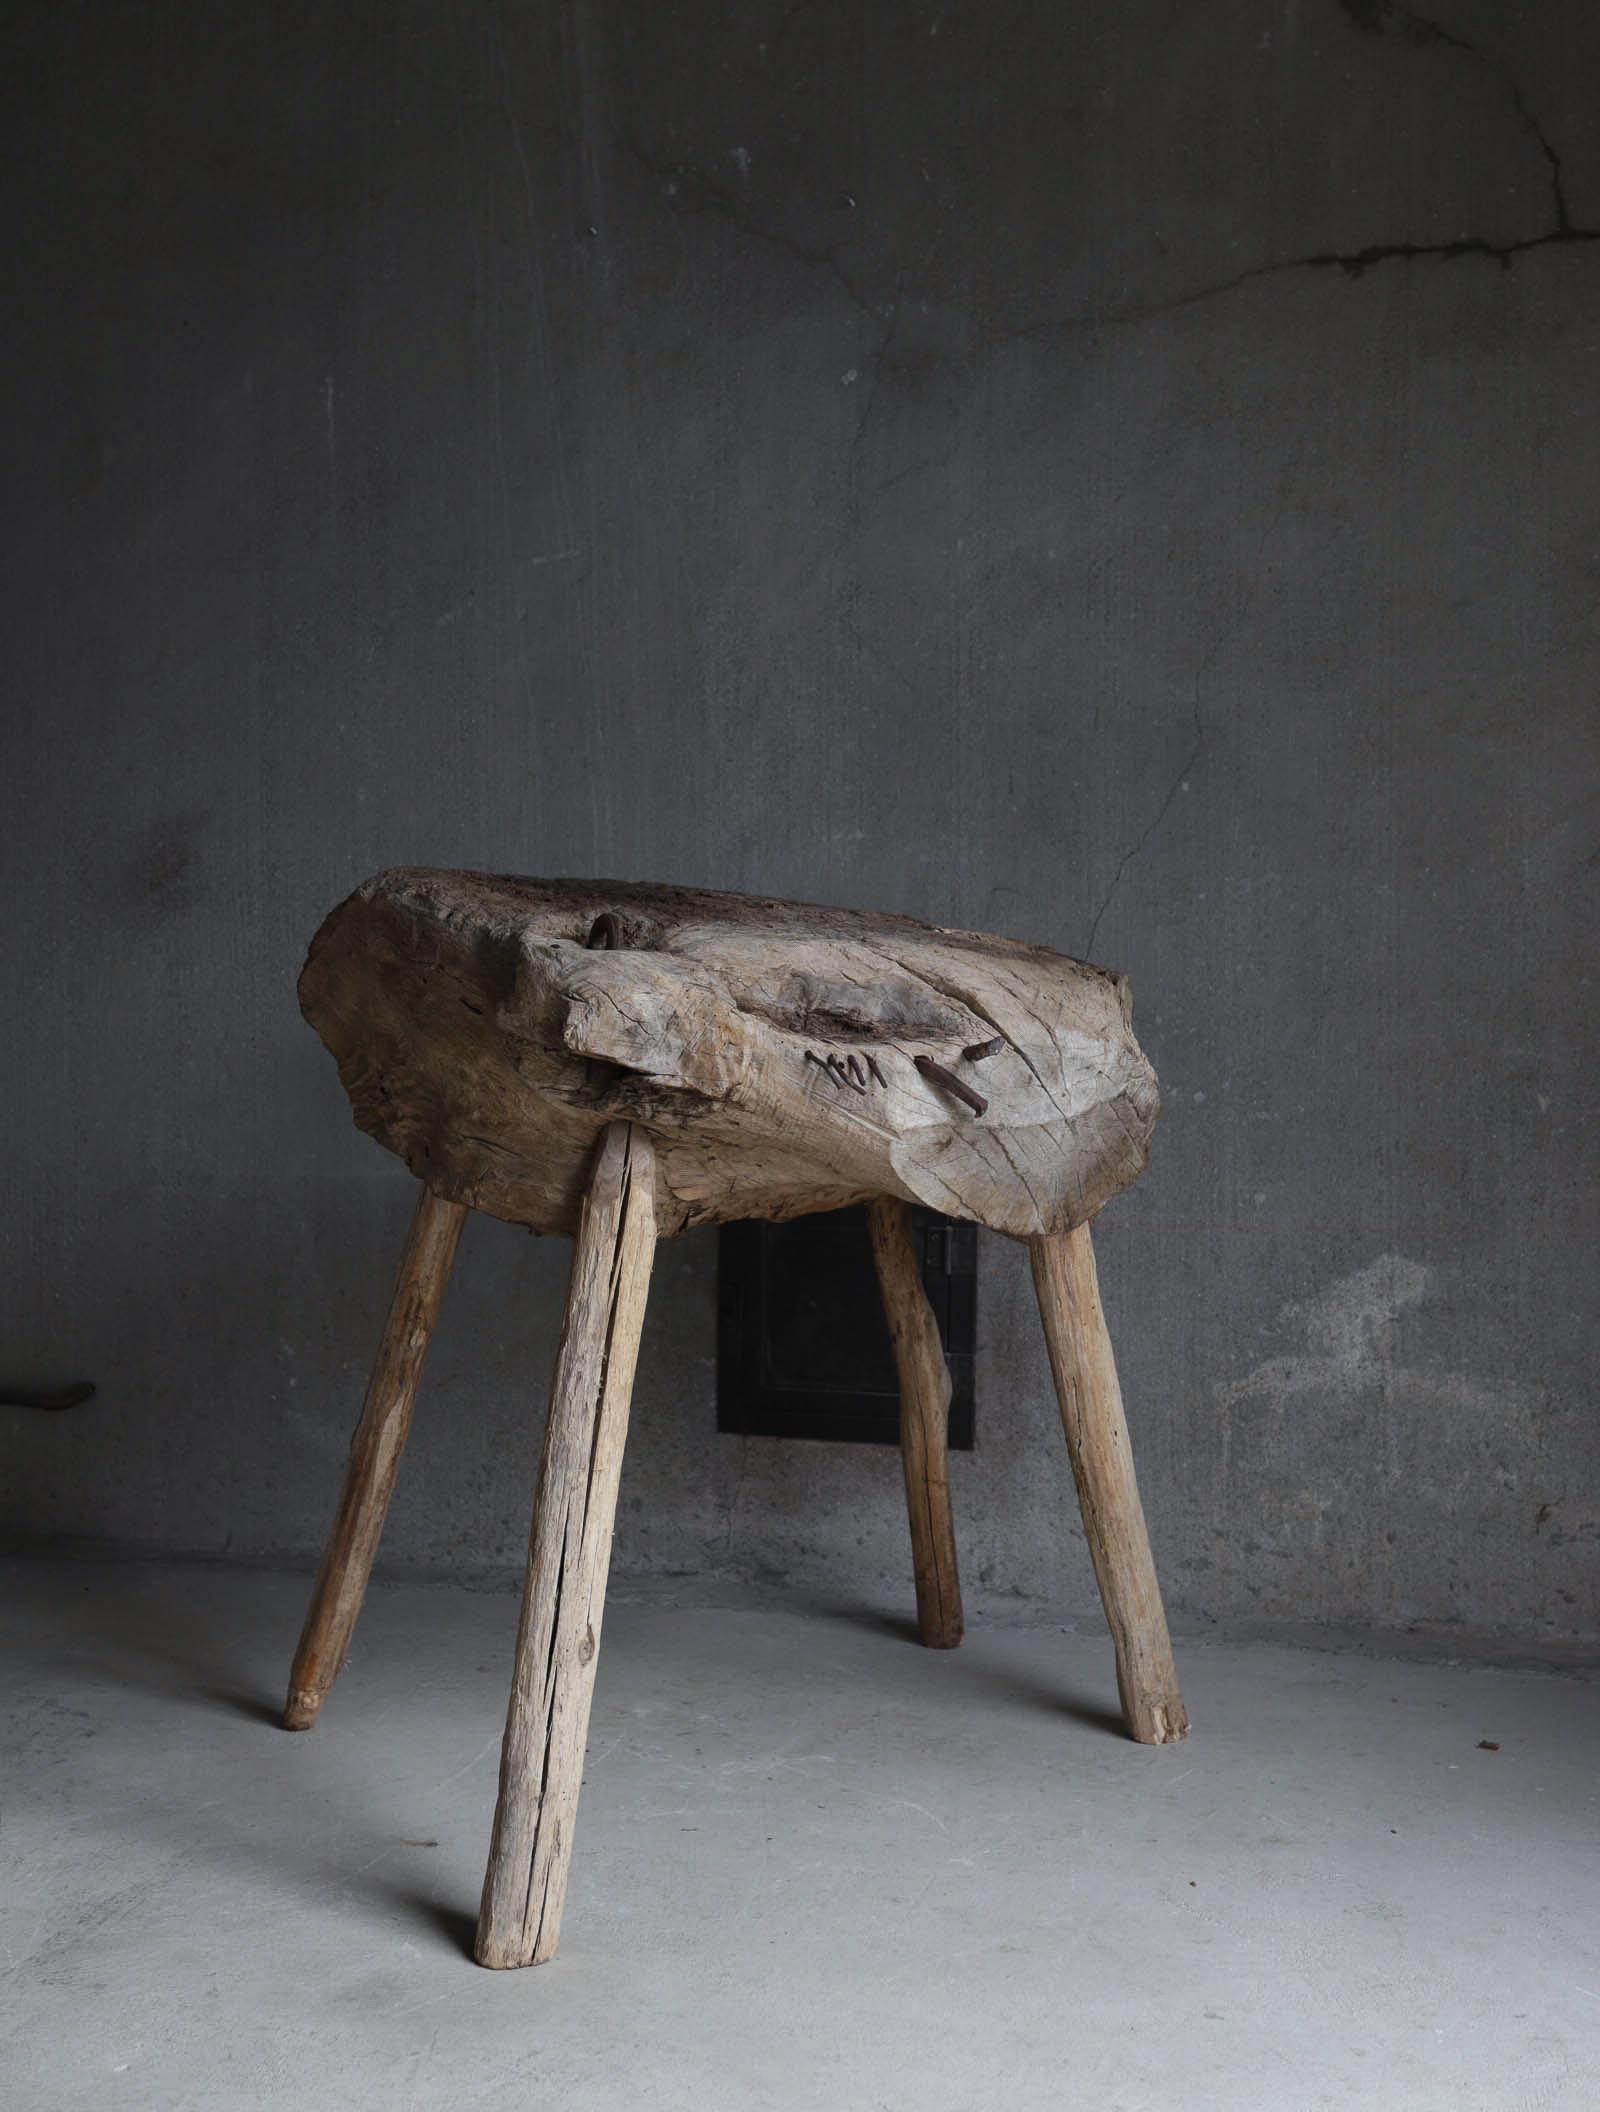 Antique Primitive Stand